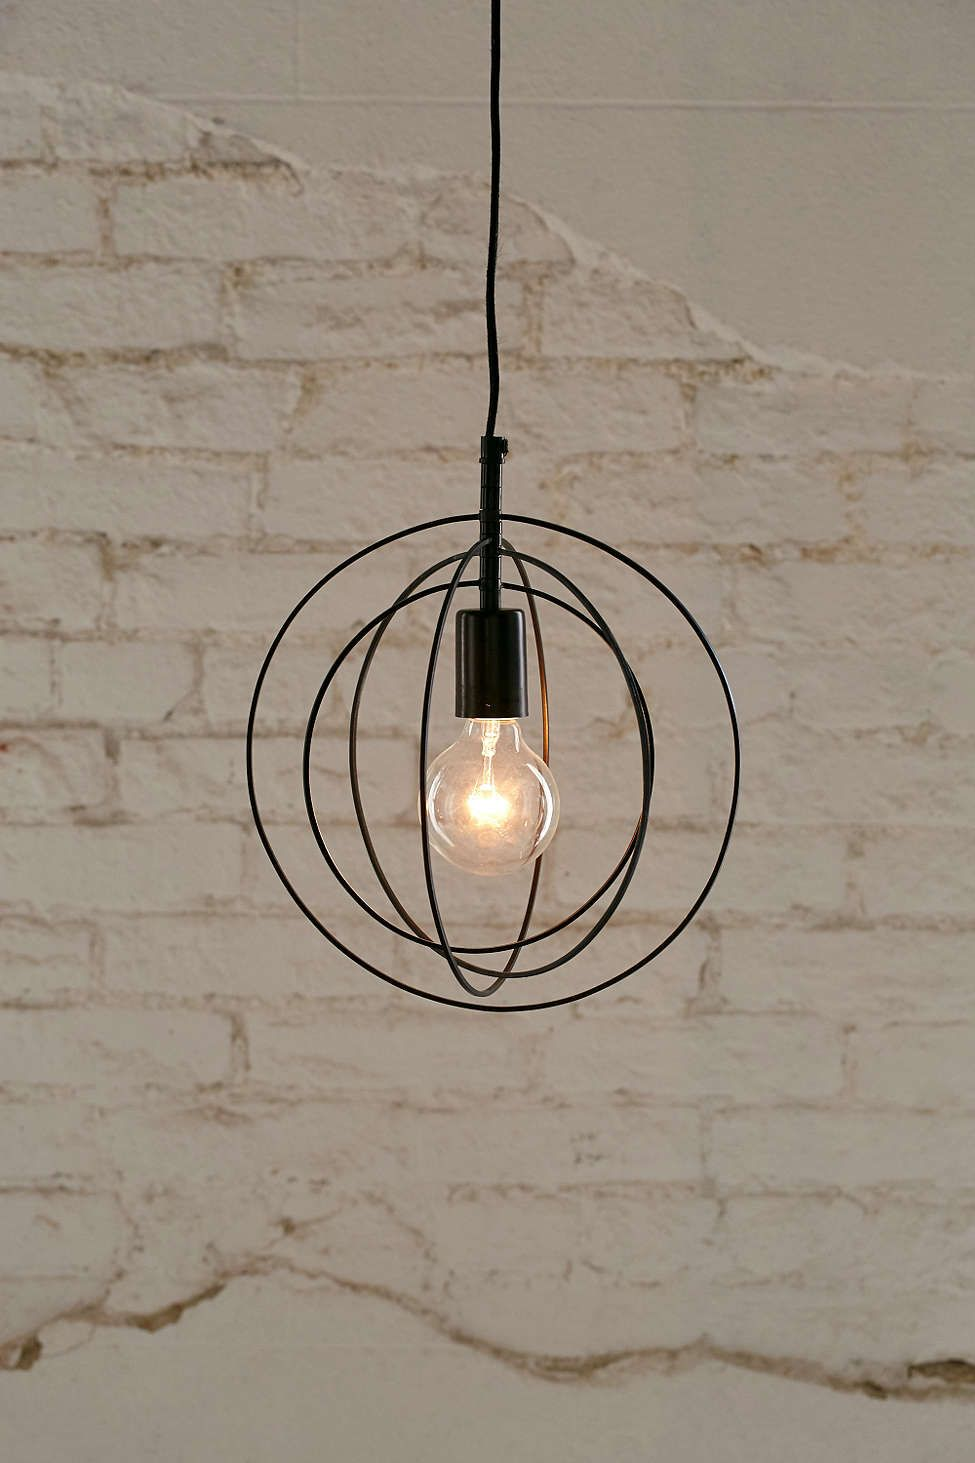 wyatt circle pendant pendant for basement stairwell pinterest. Black Bedroom Furniture Sets. Home Design Ideas